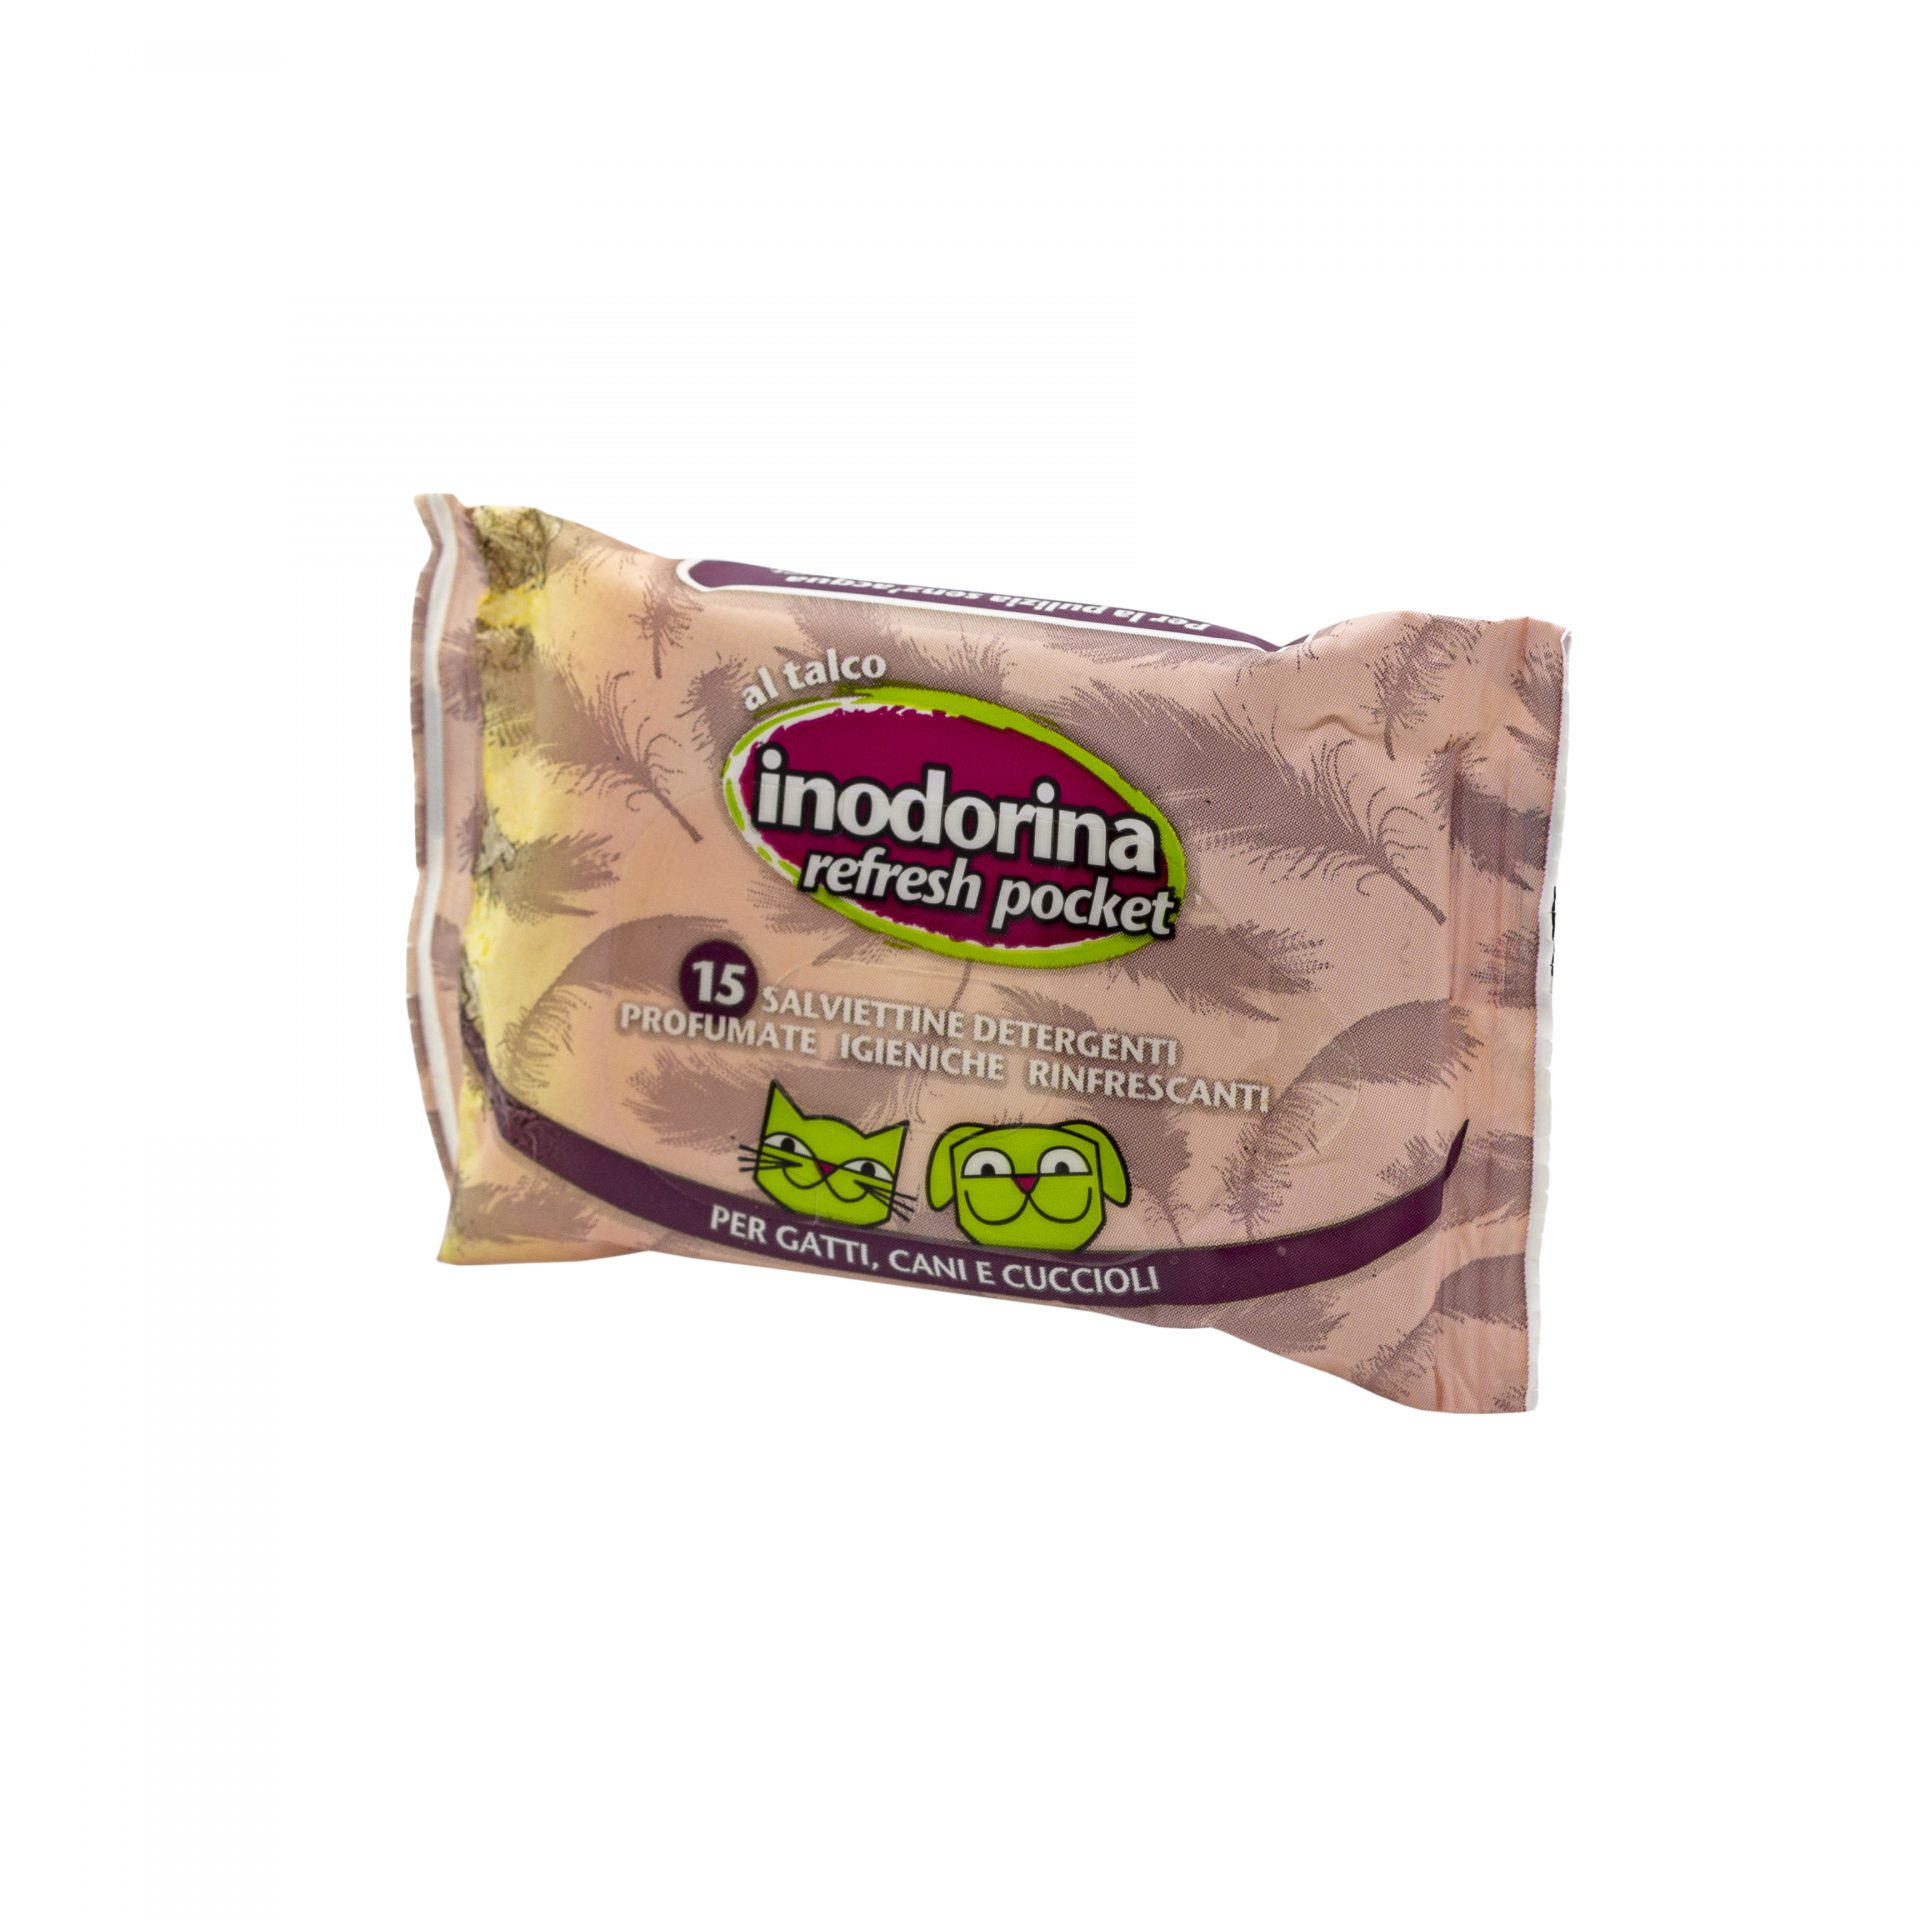 pocket-n.15-salviette-igienizzanti-alla-clodexidina-o-al-talco